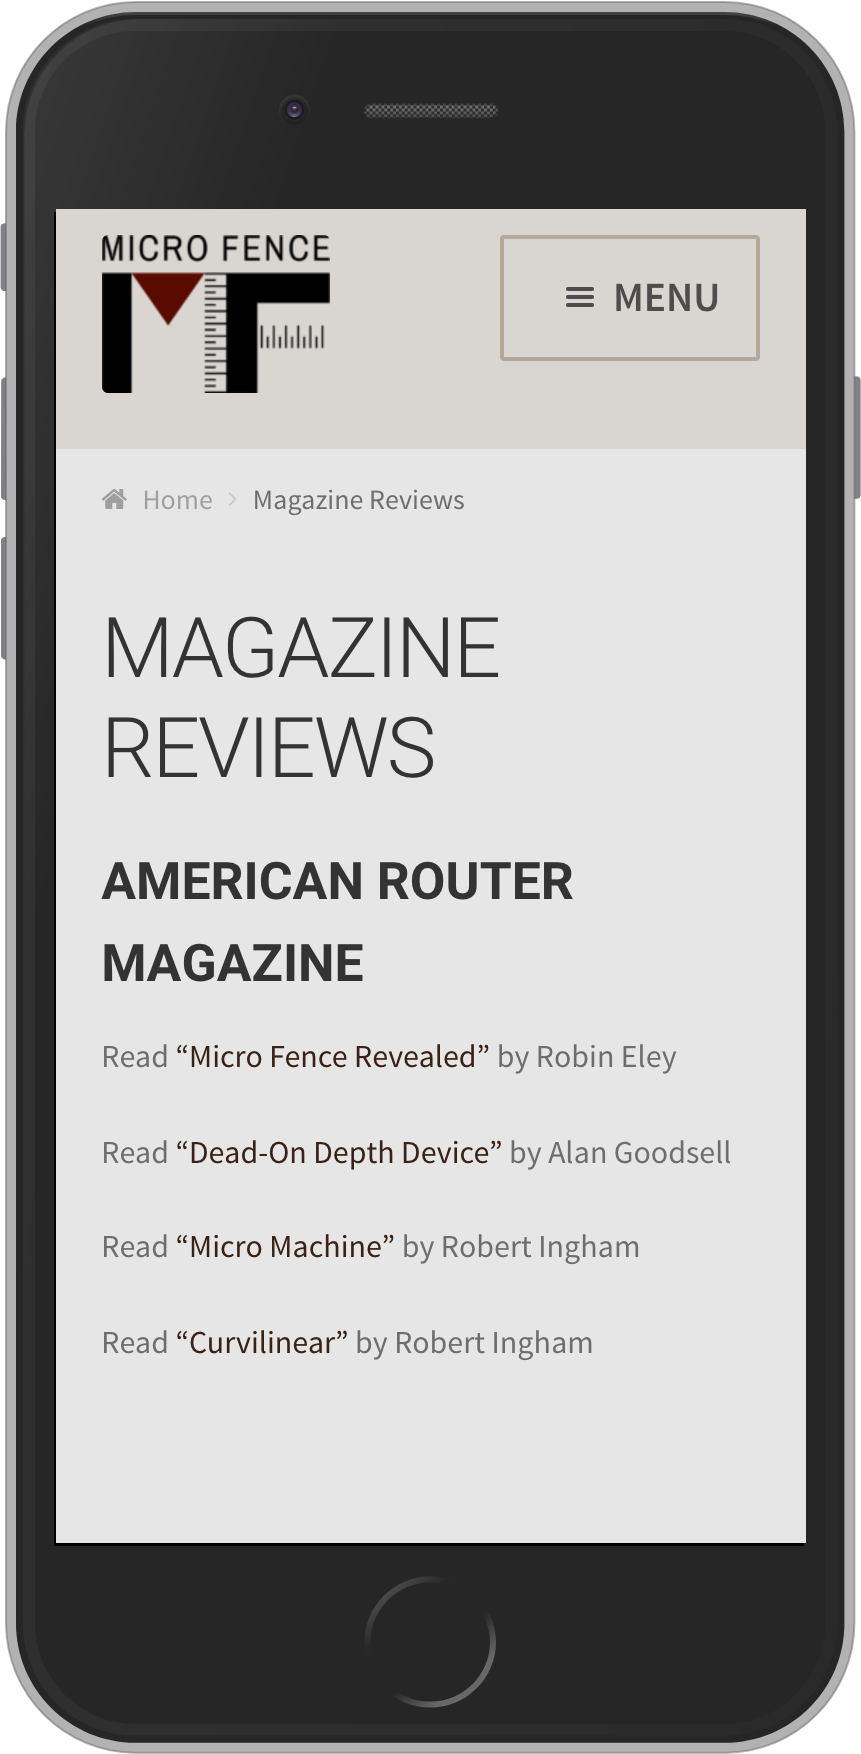 microfence.uwldev.com-magazine-reviews-(iPhone 6)